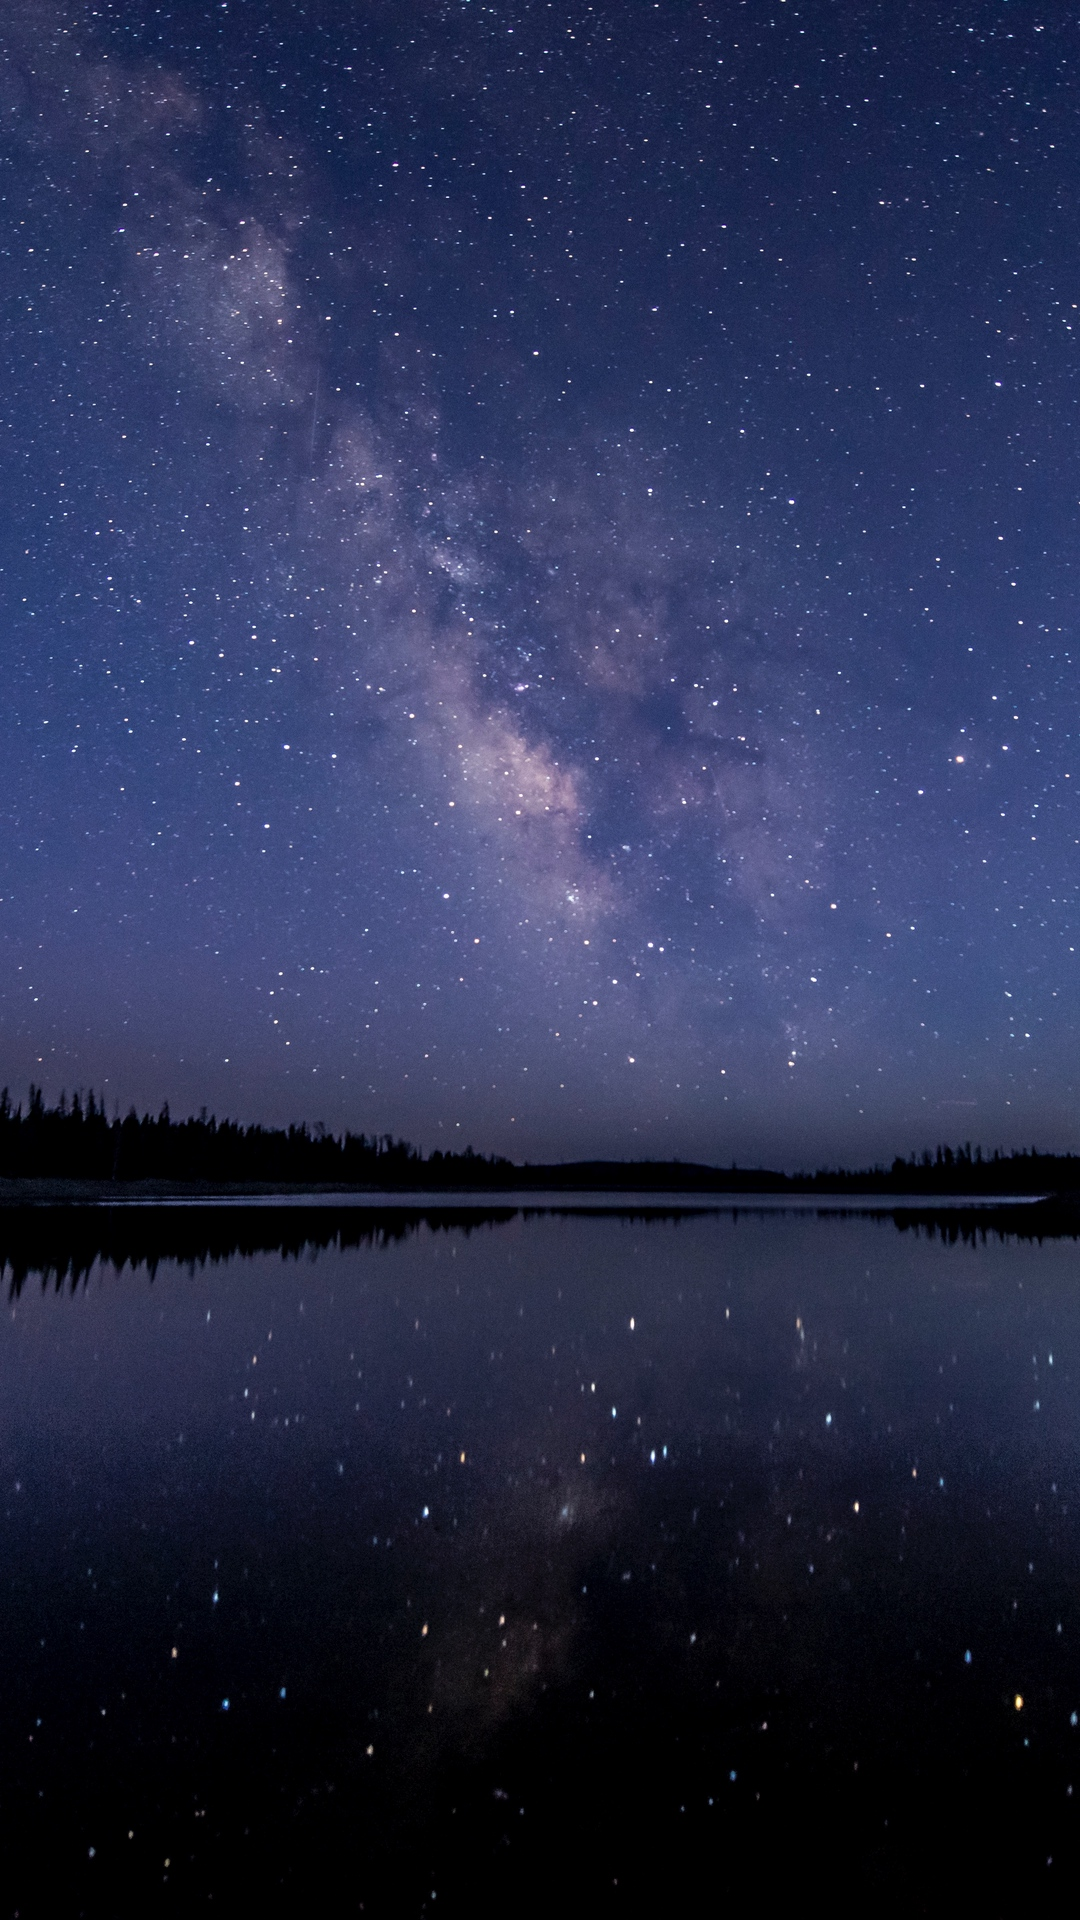 Night Sky Stars Starry Sky Wallpaper 1080x1920